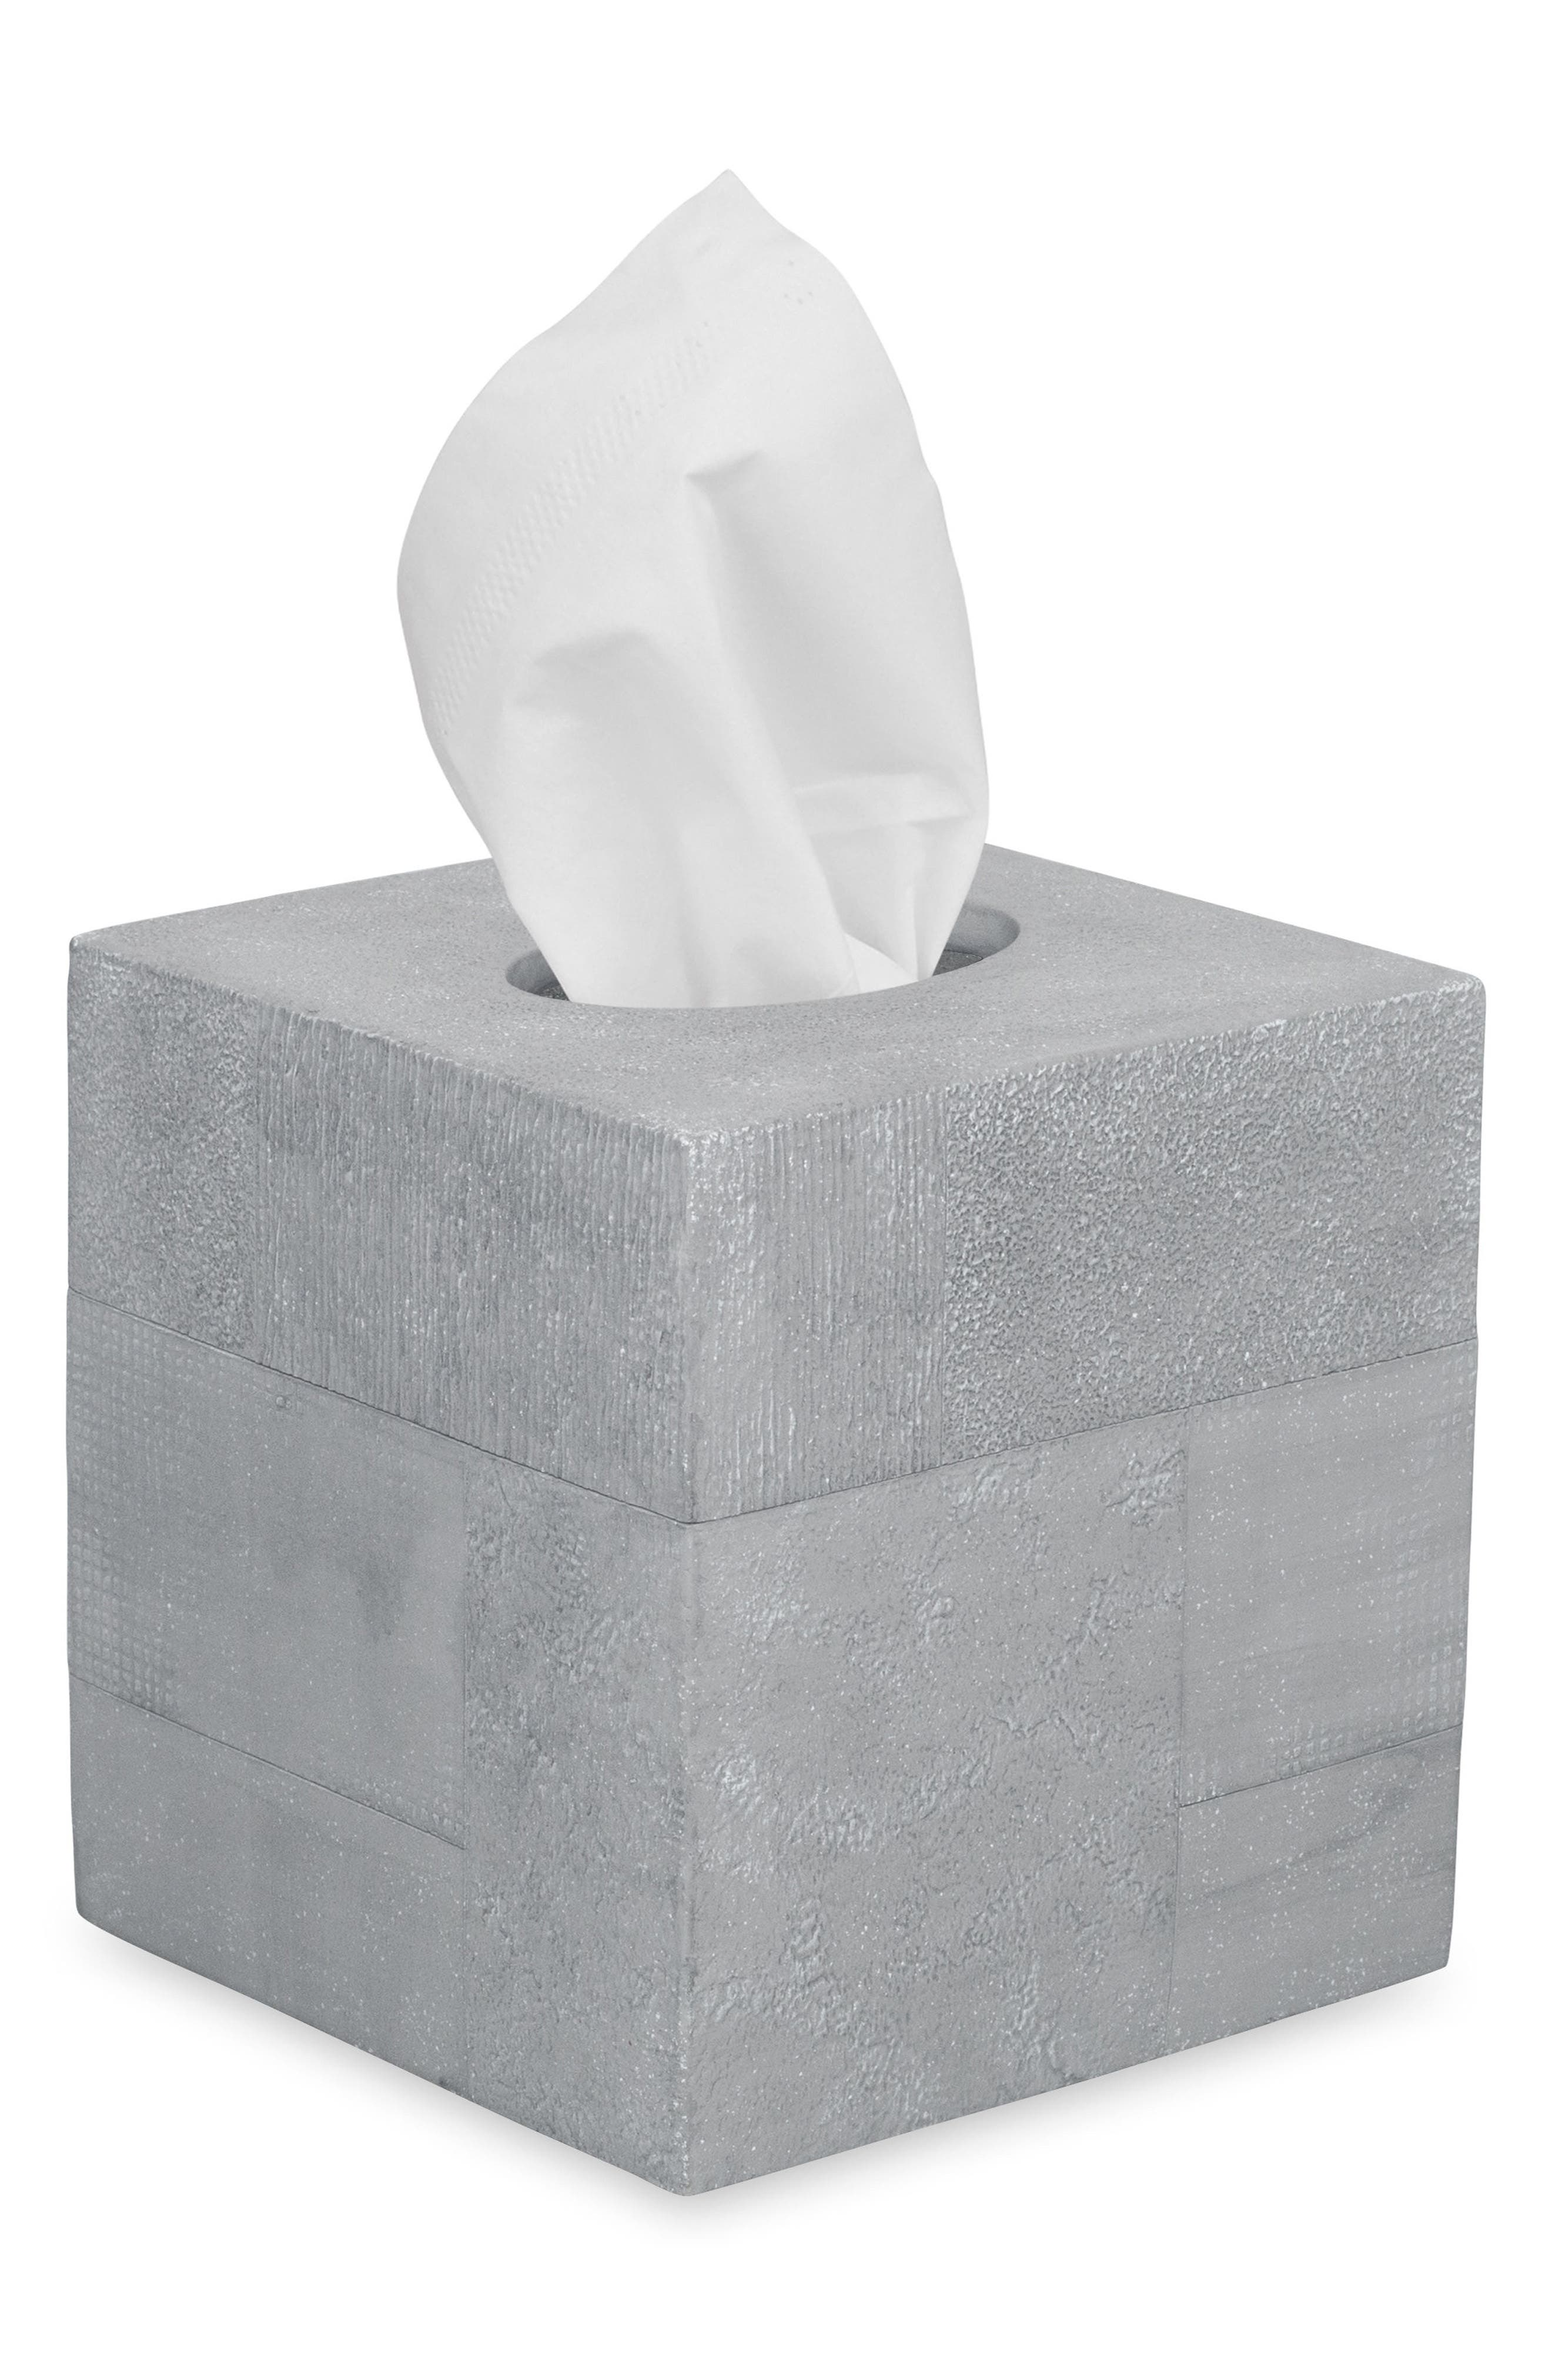 DKNY, Cornerstone Tissue Box Cover, Main thumbnail 1, color, GREY